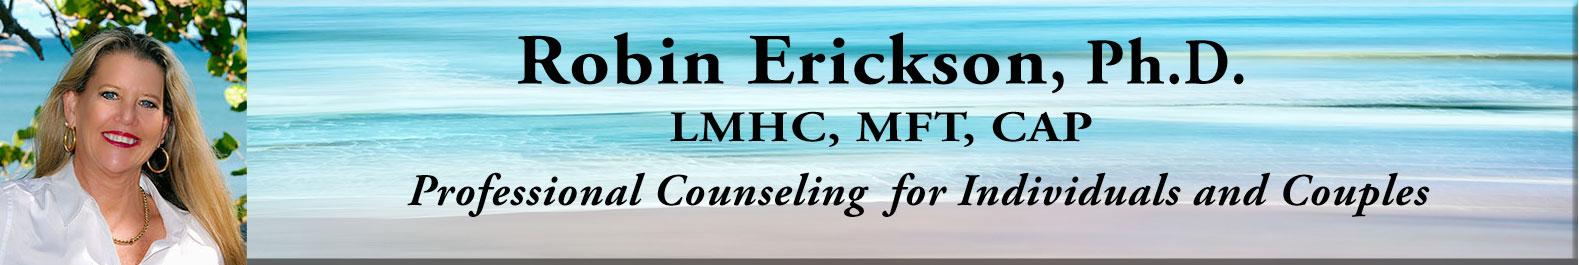 Dr. Robin Erickson, Ph.D., LMHC, MFT, CAP